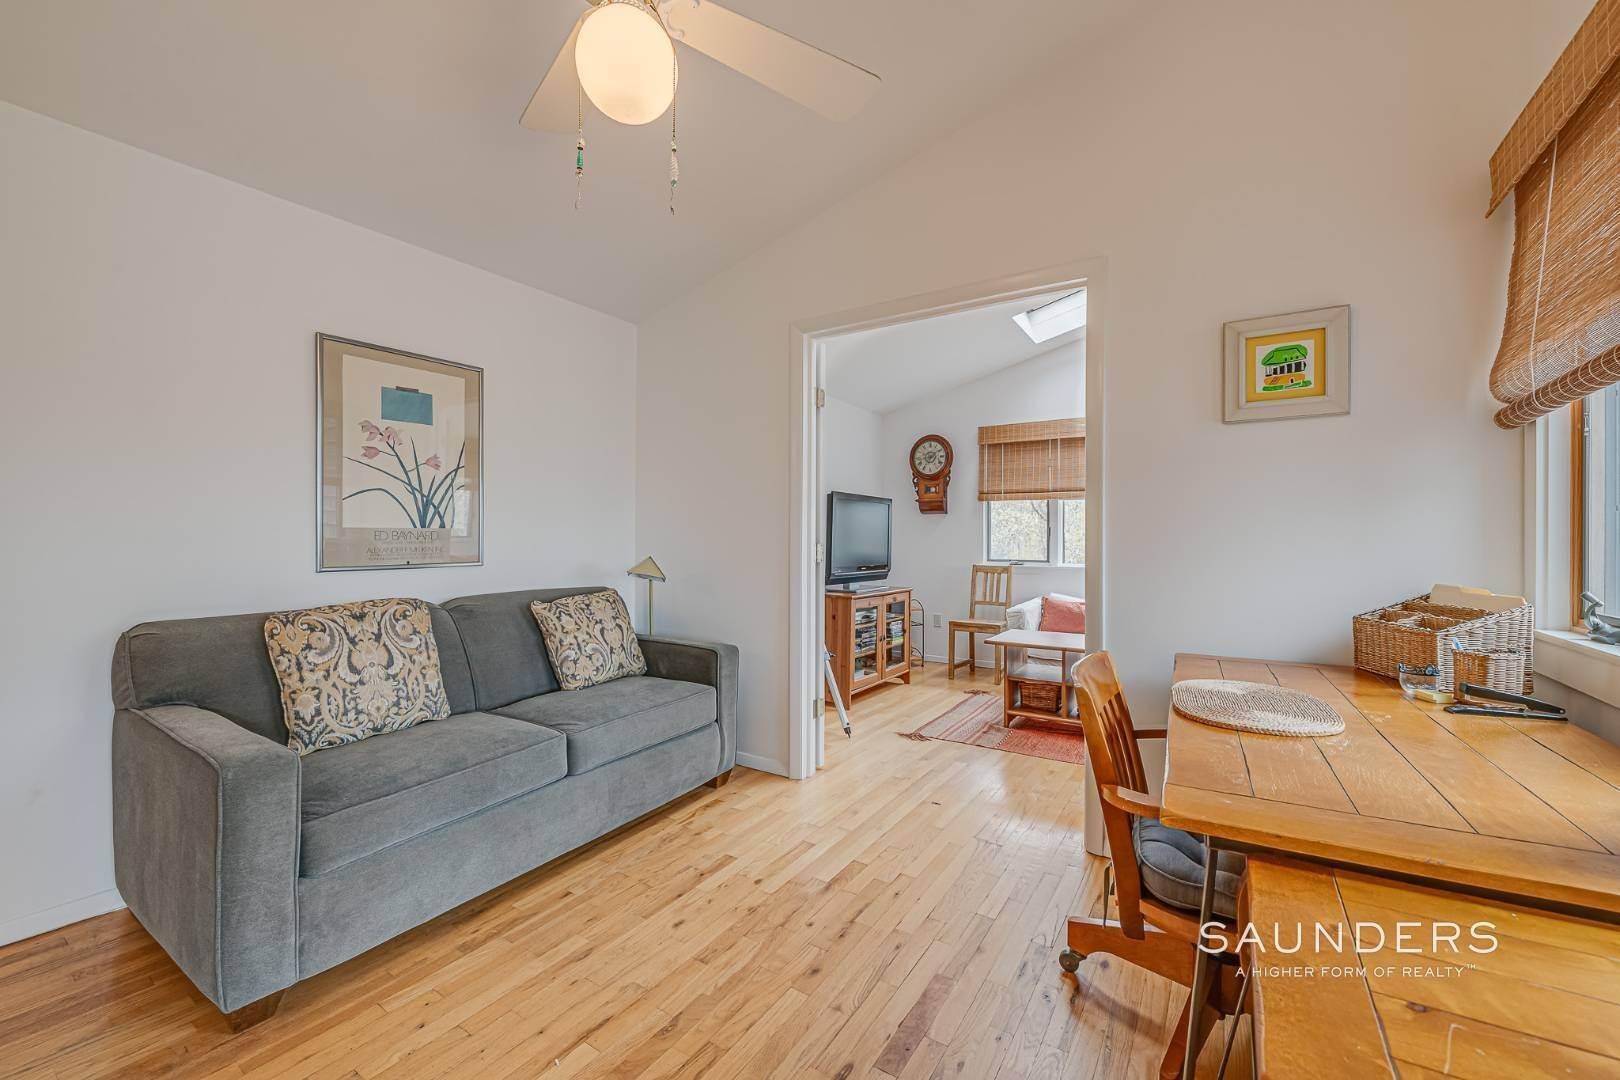 8. Single Family Homes for Sale at Montauk Beach House 8 Stuyvesant Drive, Montauk, East Hampton Town, NY 11954